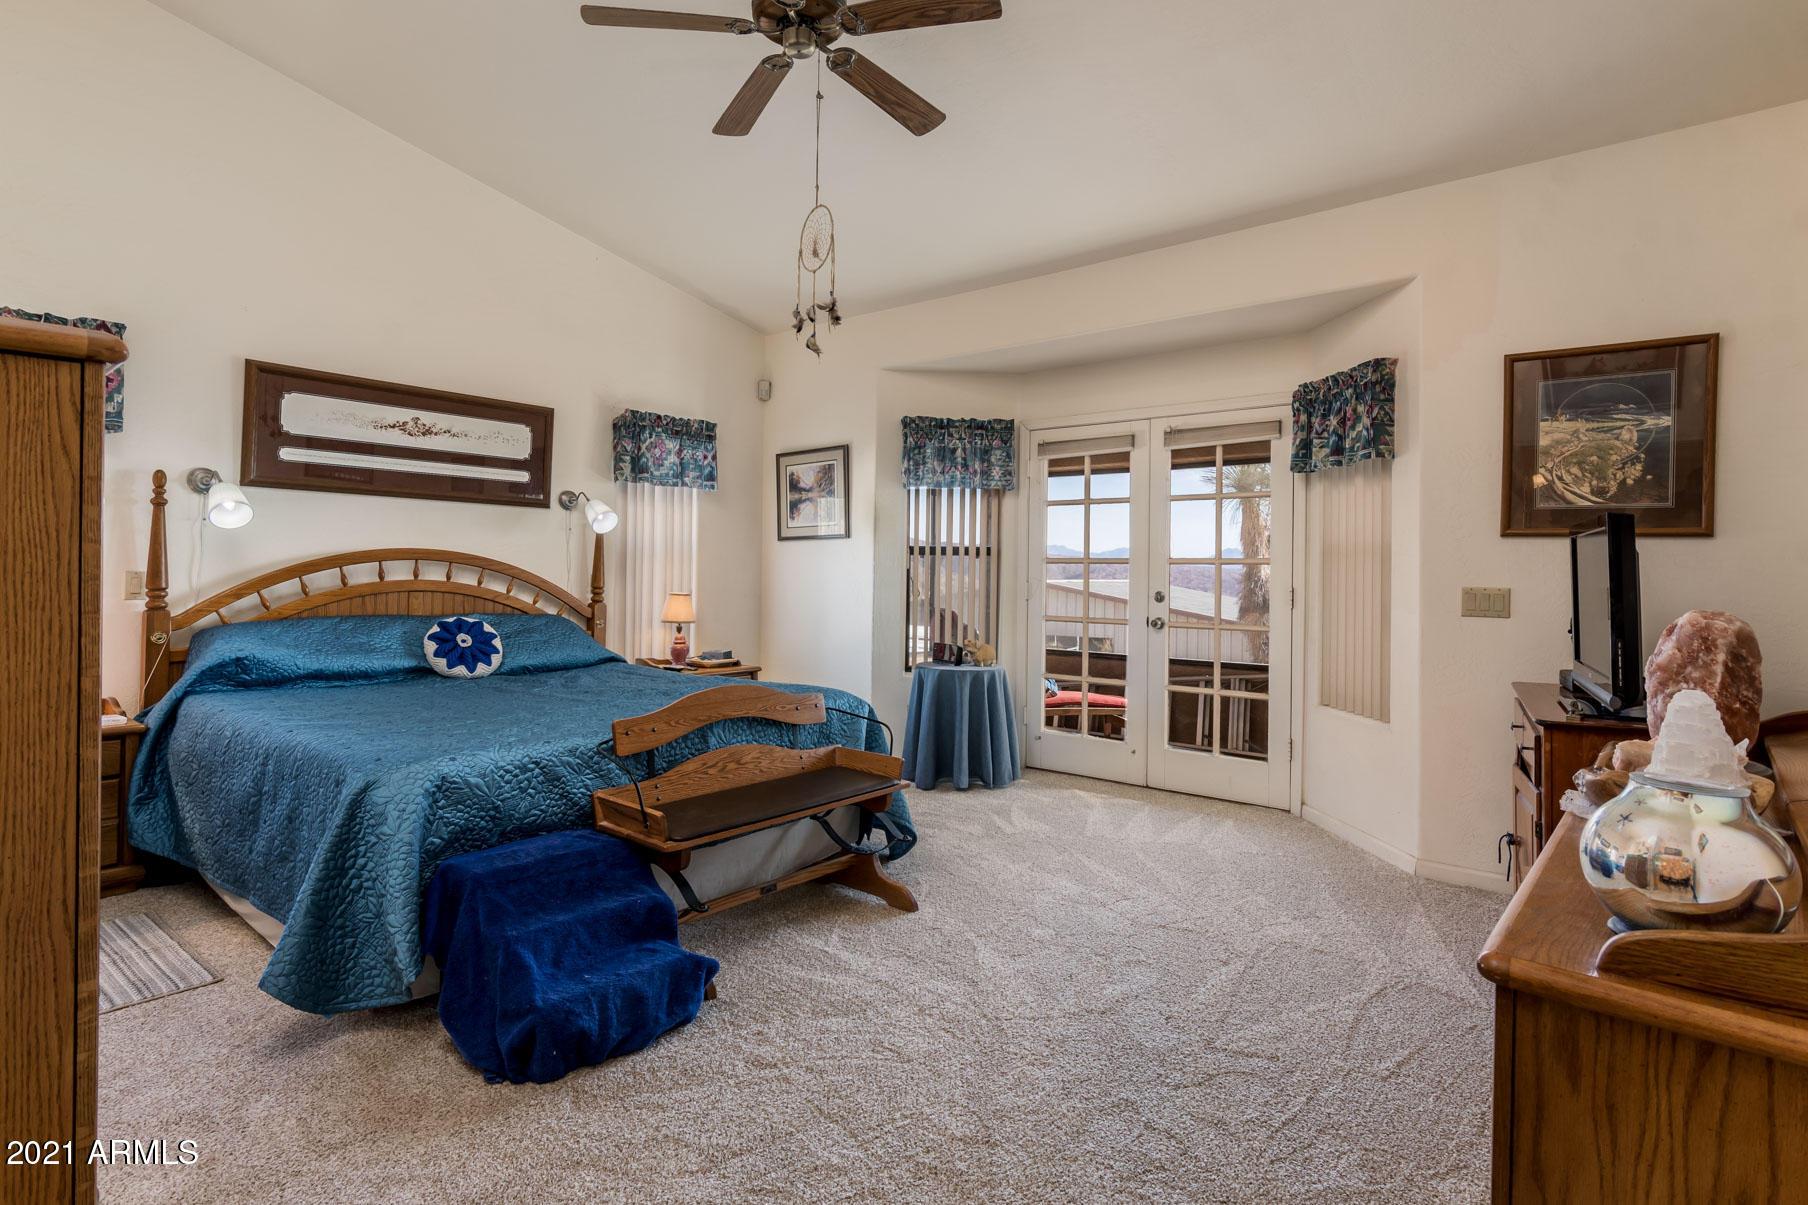 43003 OLD MINE Road, Cave Creek, Arizona 85331, 3 Bedrooms Bedrooms, ,2 BathroomsBathrooms,Residential,For Sale,OLD MINE,6182802